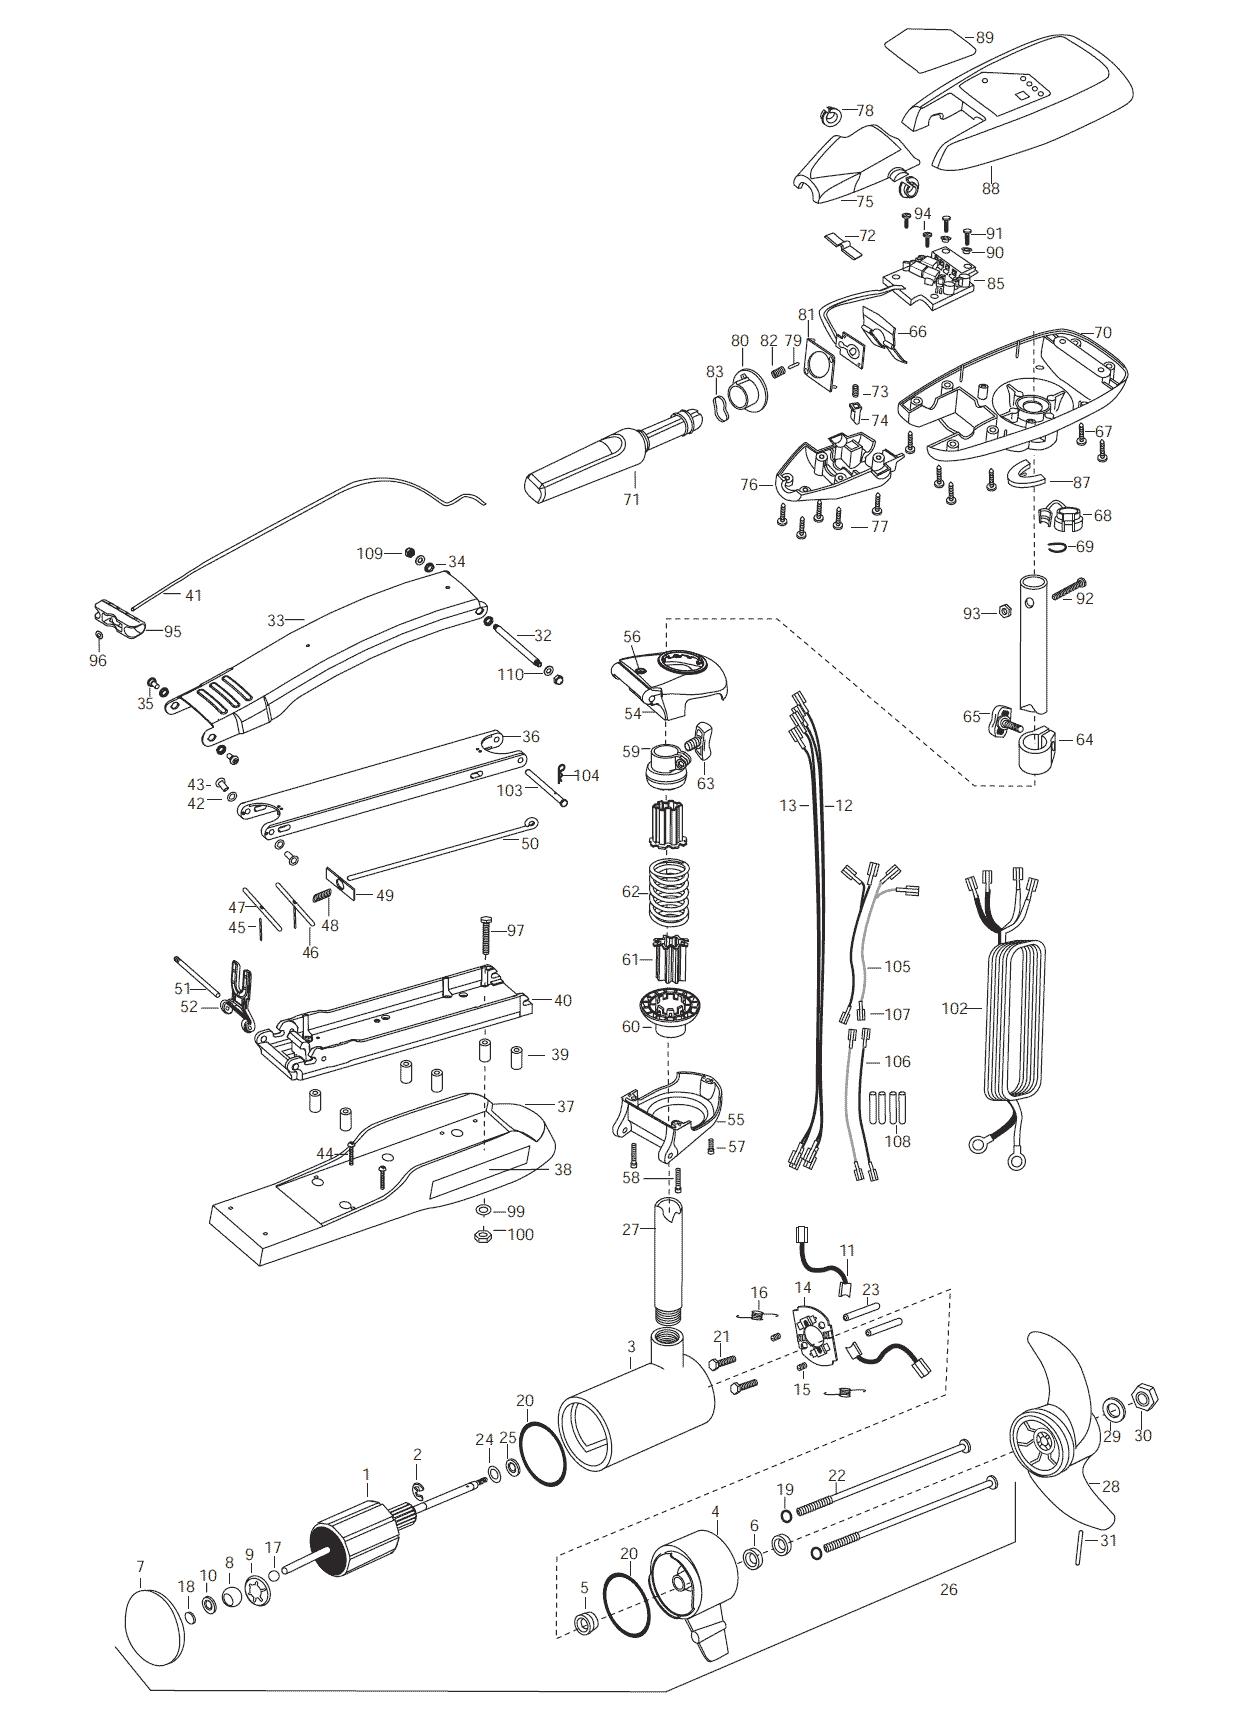 minn kota maxxum 74 hand control  52 inch  parts